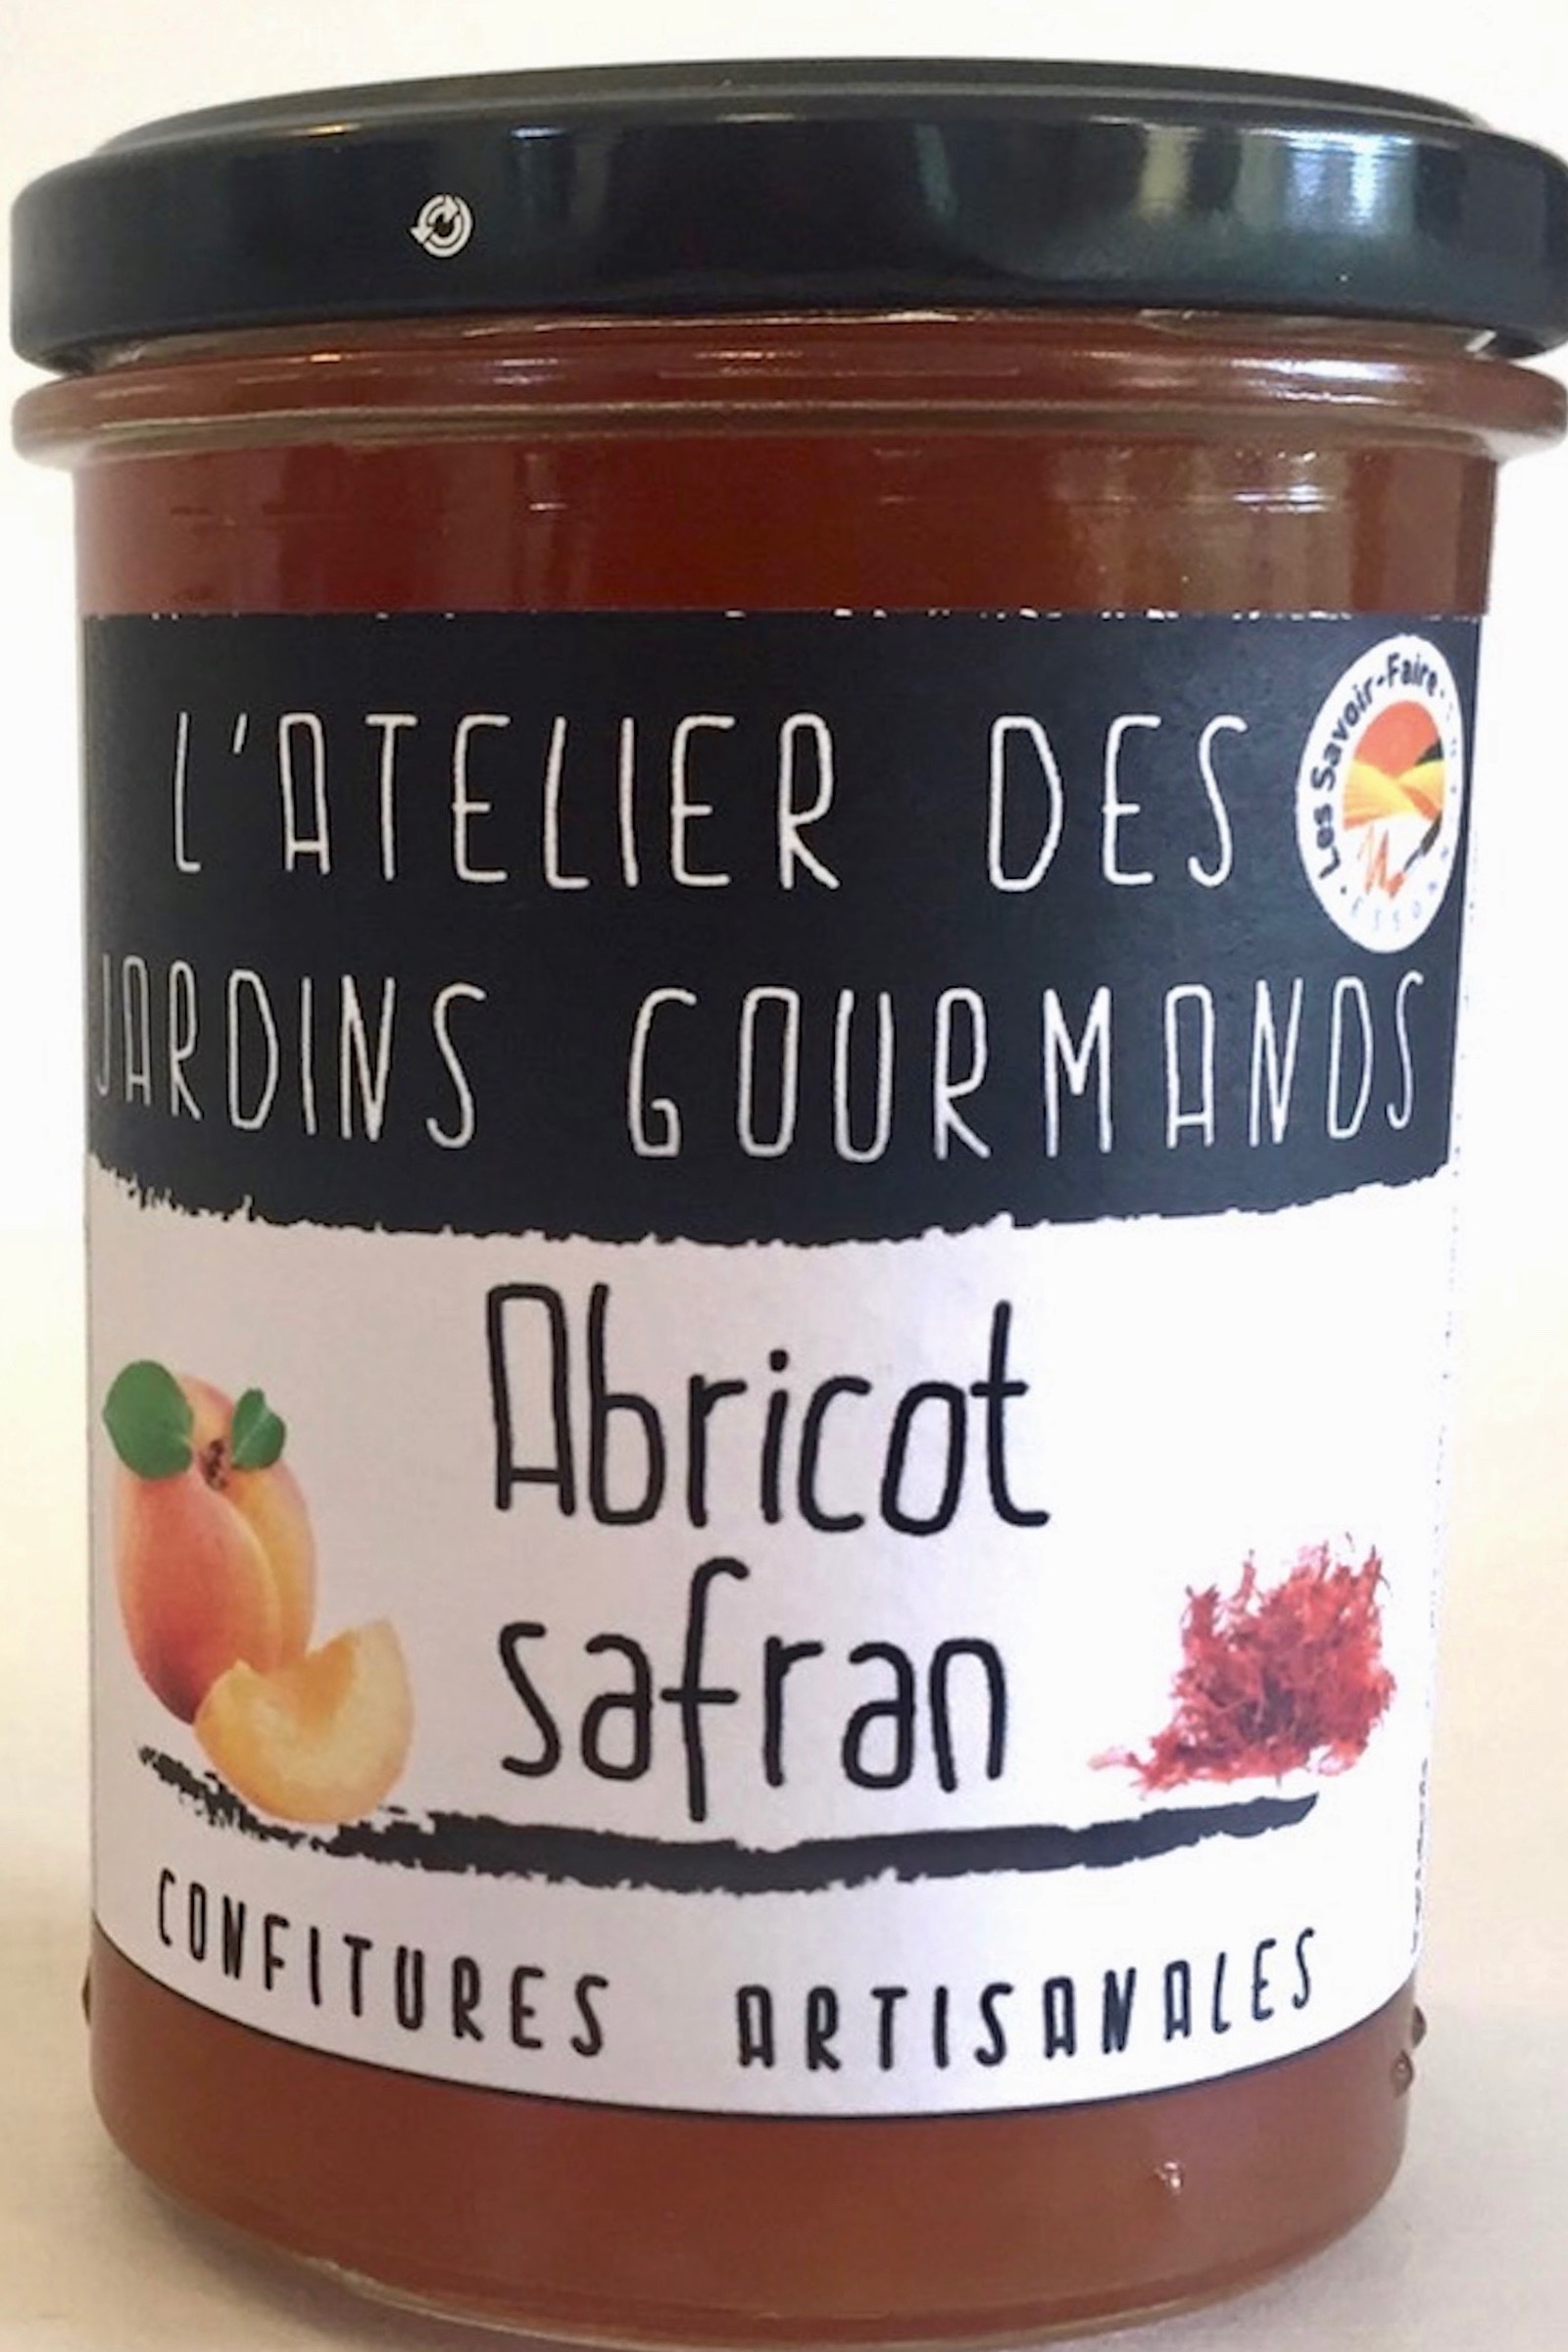 Abricot safran atelier des jardins gourmands